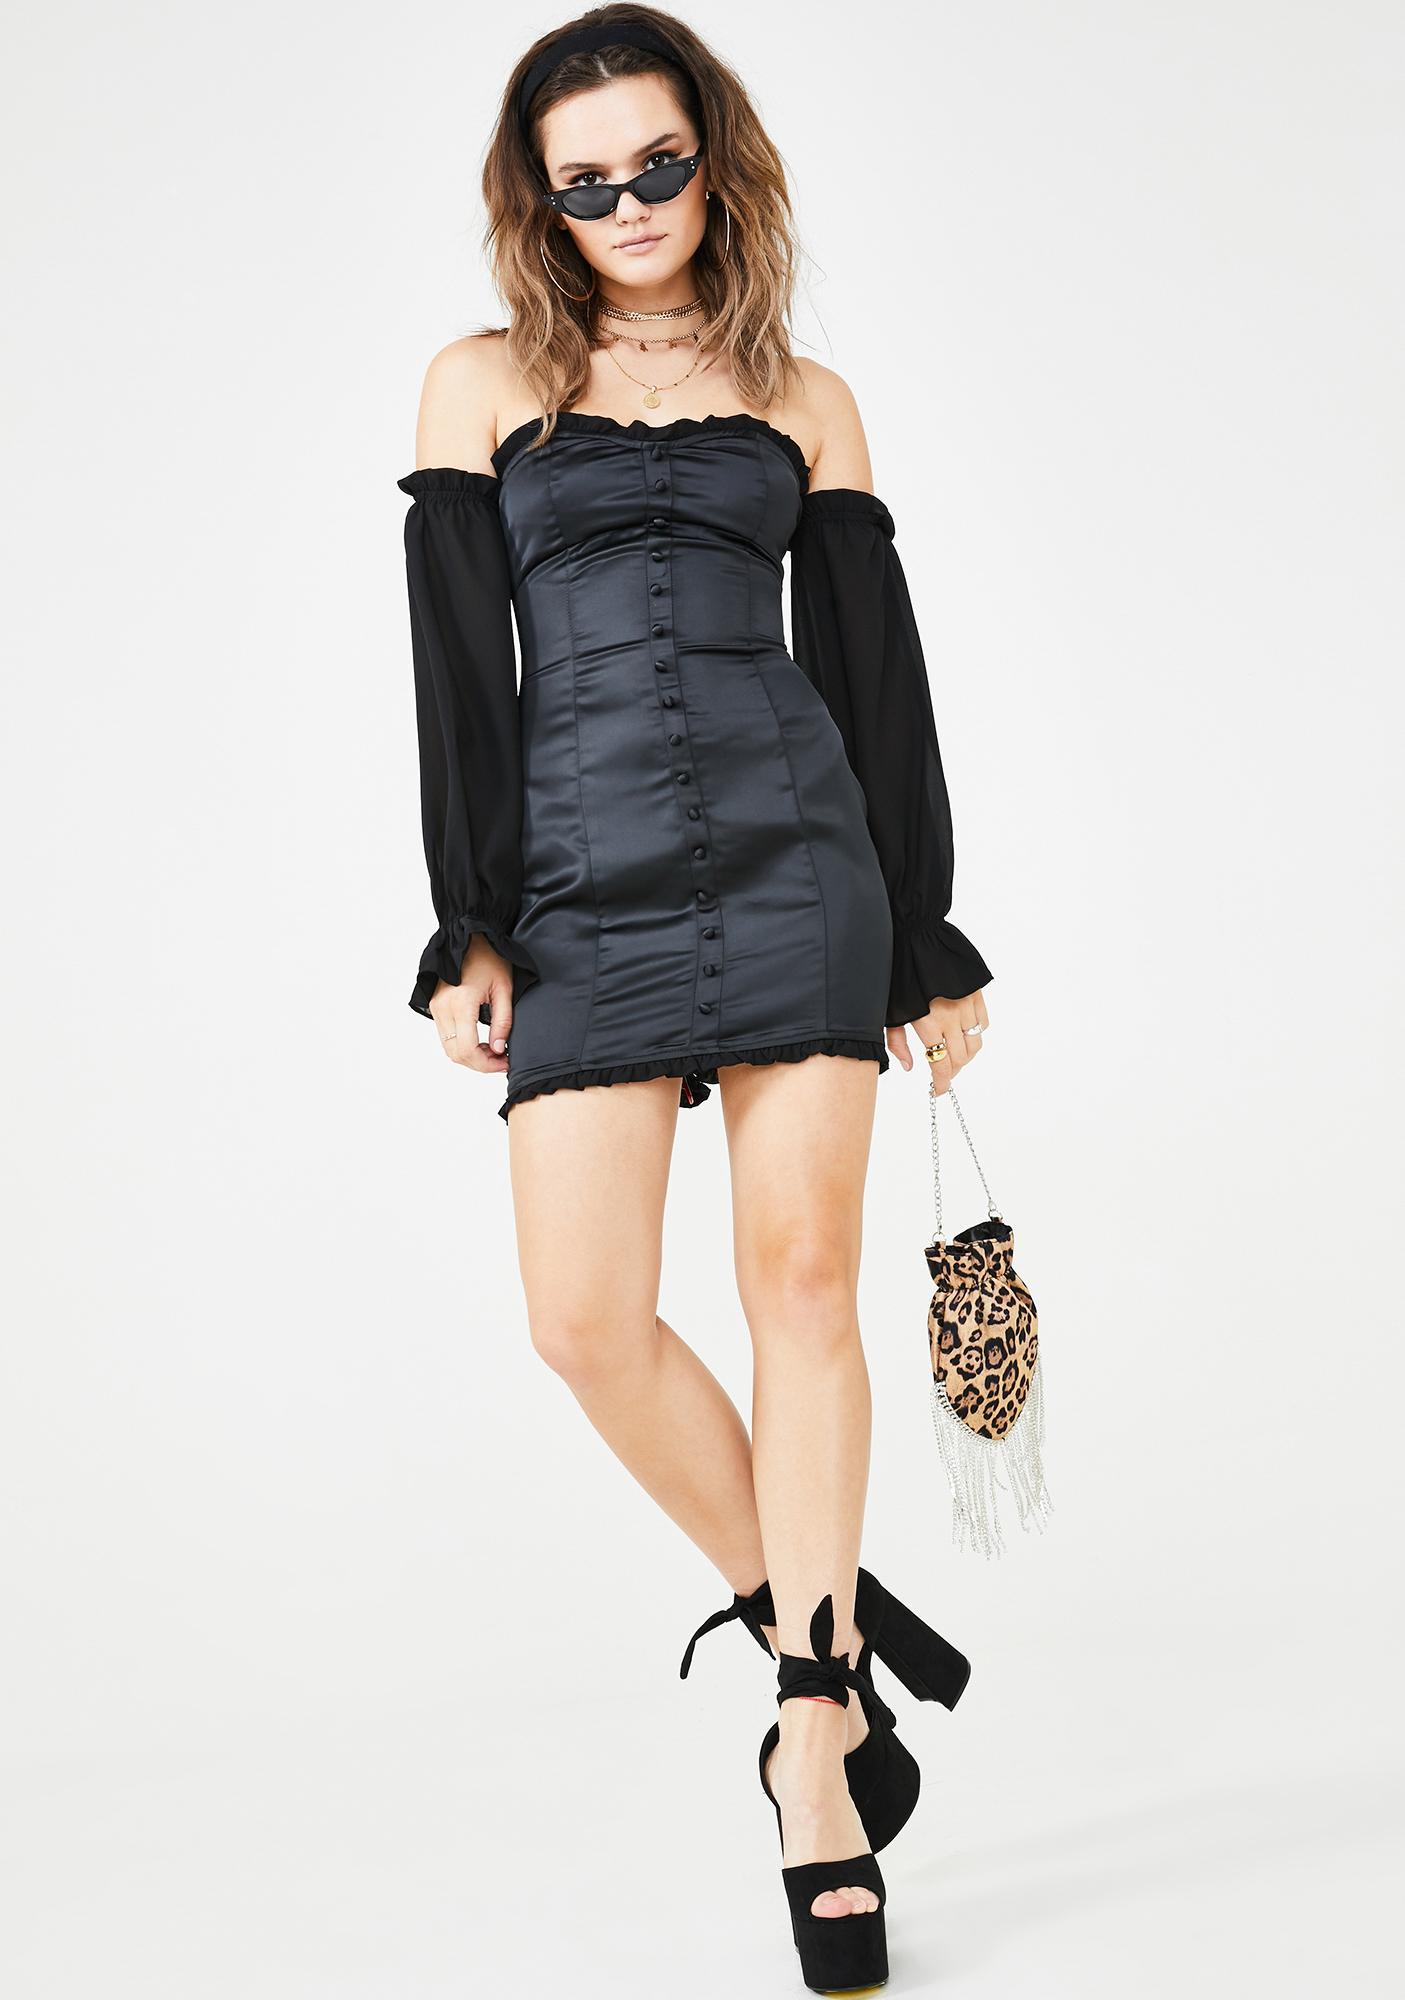 Lioness Midnight Good Girl Bad Bish Mini Dress